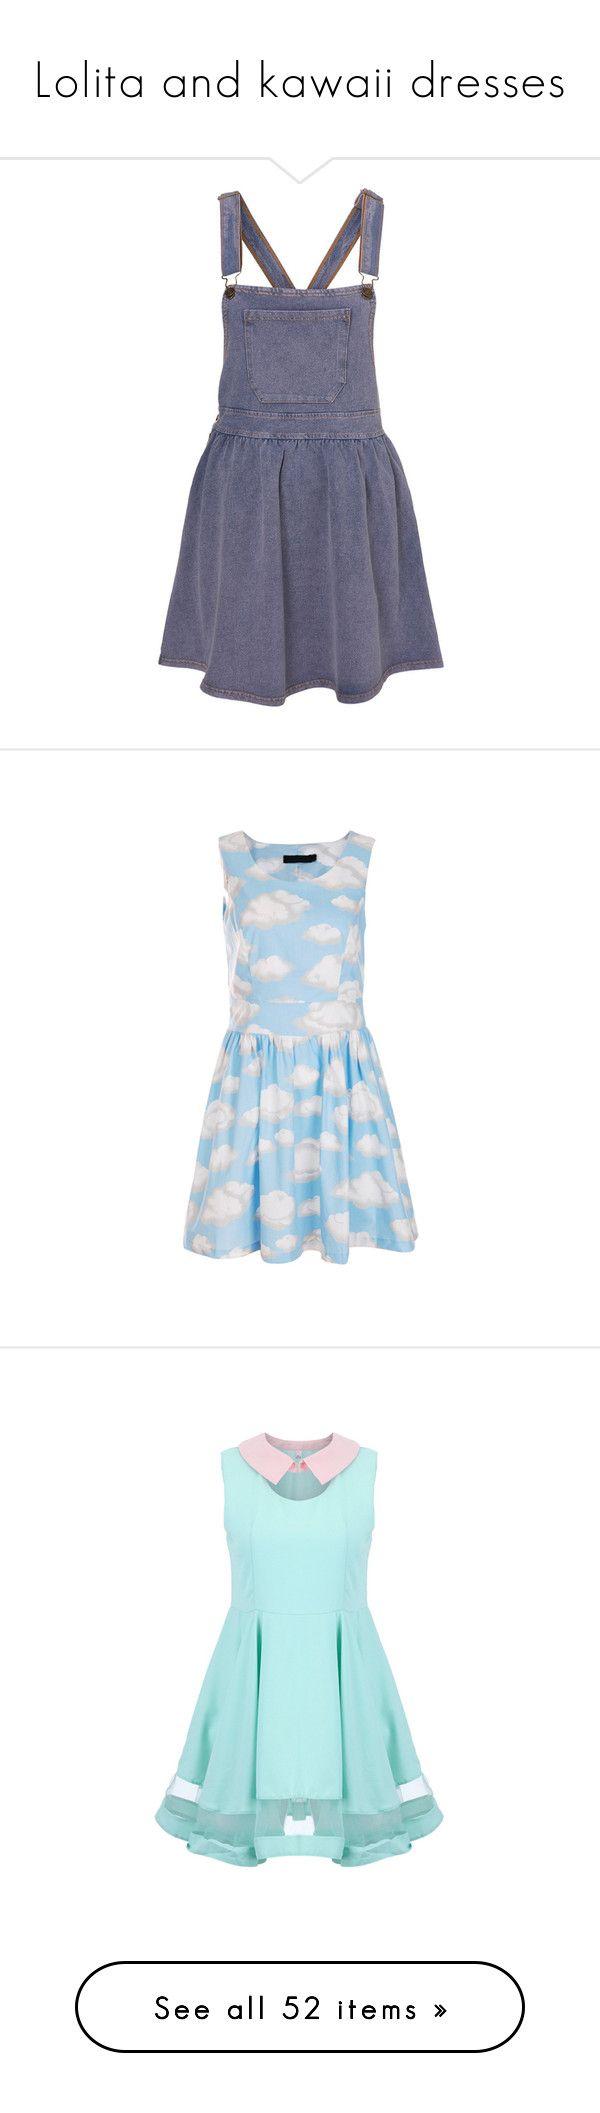 """Lolita and kawaii dresses"" by kawaii-senpai ❤ liked on Polyvore featuring dresses, skirts, overalls, denim, women, blue jersey, blue pinafore dress, long blue dress, long denim dress and denim pinafore dress"